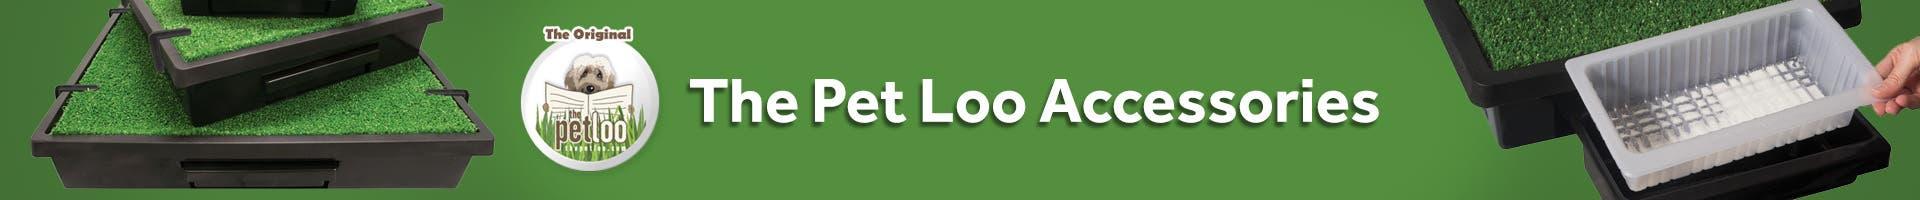 Pet Loo Accessories